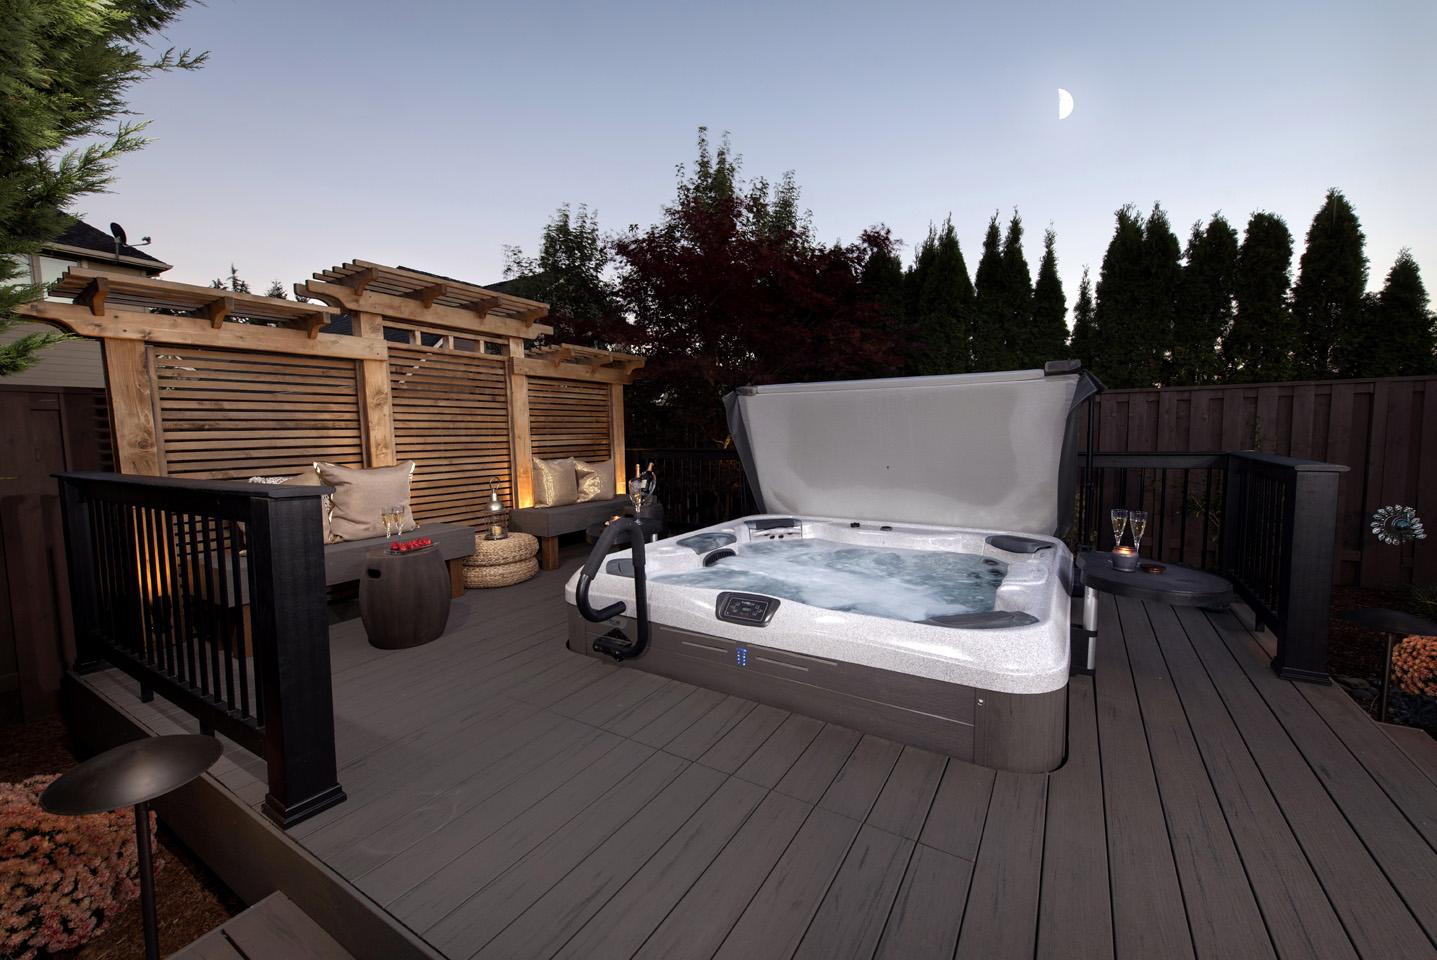 Hot Tub in landscape